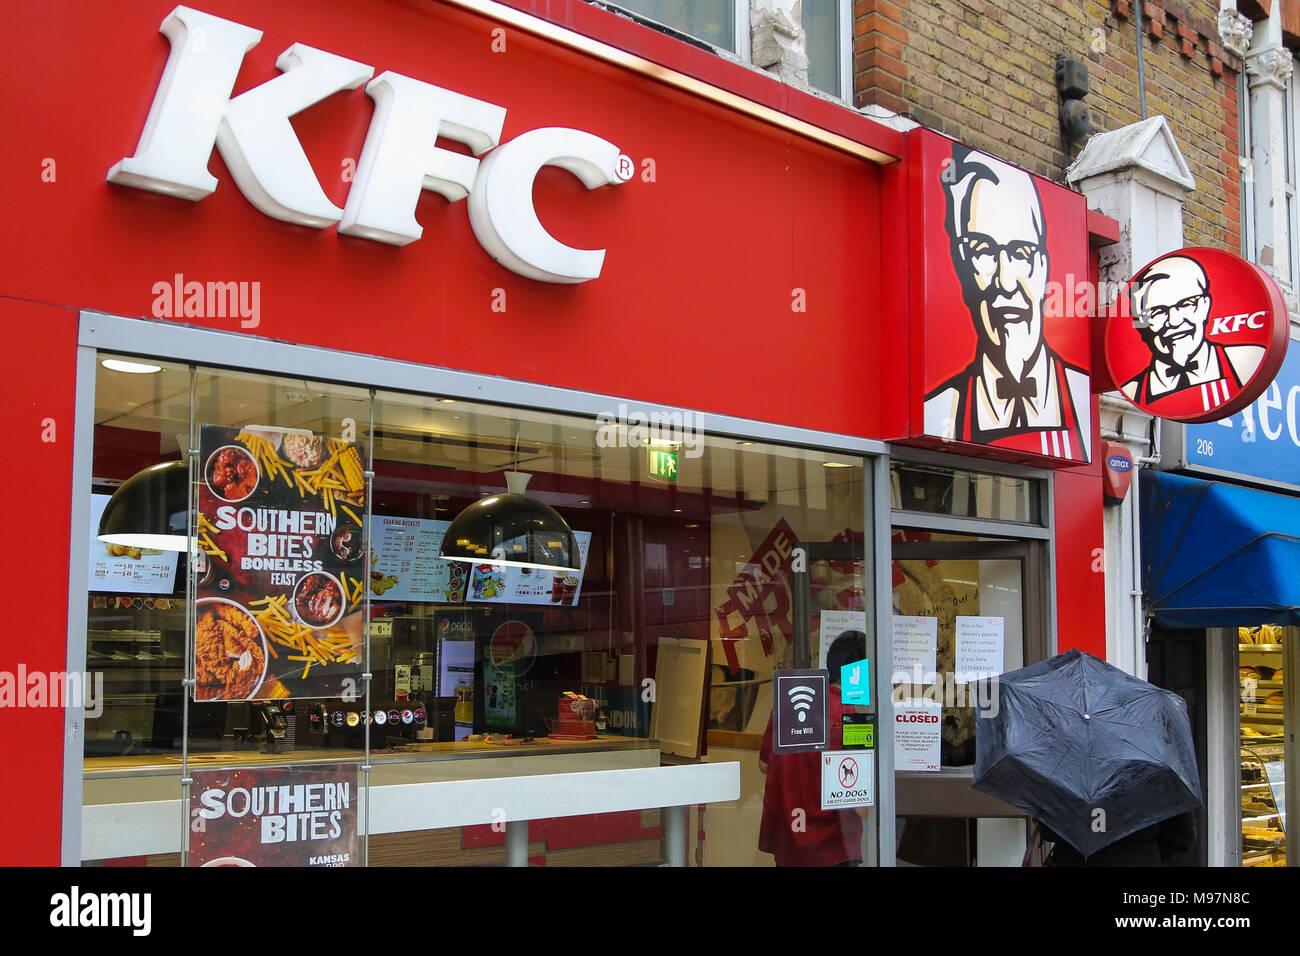 Kentucky Fried Chicken (KFC) fast food restaurant in Wood